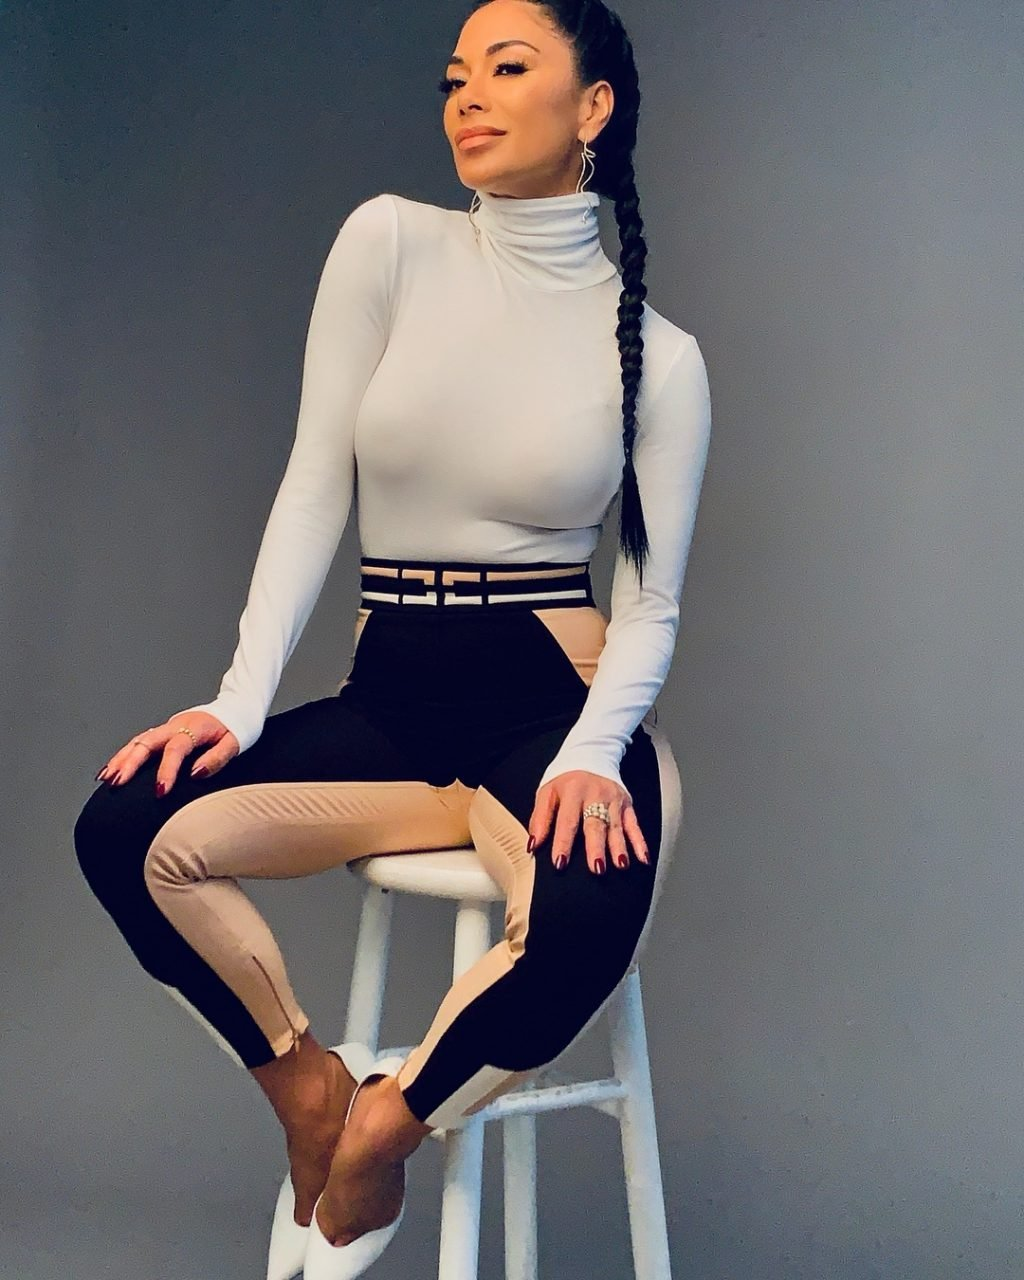 Nicole Scherzinger Sexy (6 Photos)